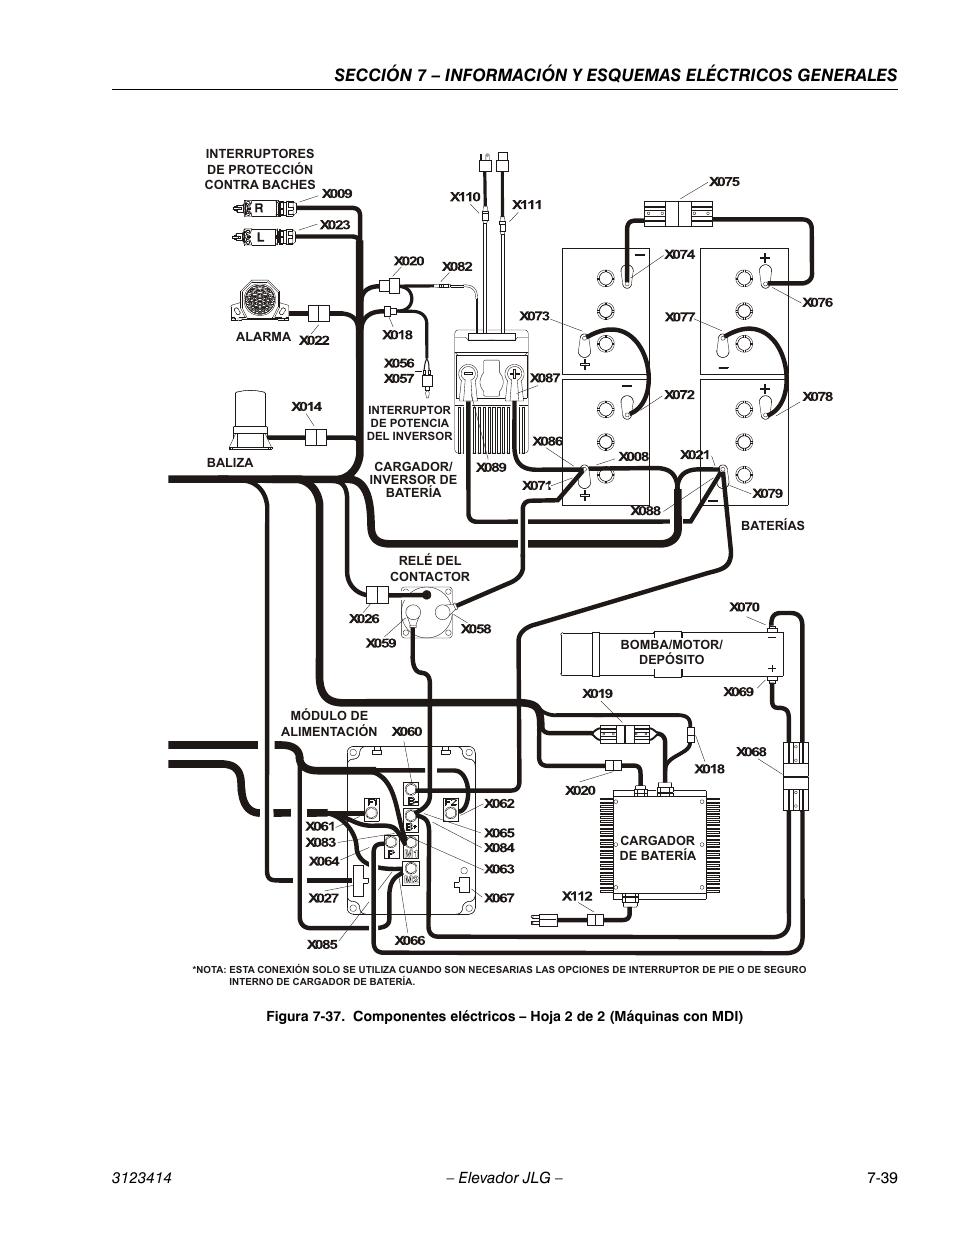 Jlg 3246 Wiring Diagram Auto Electrical Exelent 1930es Scissor Lift Vignette